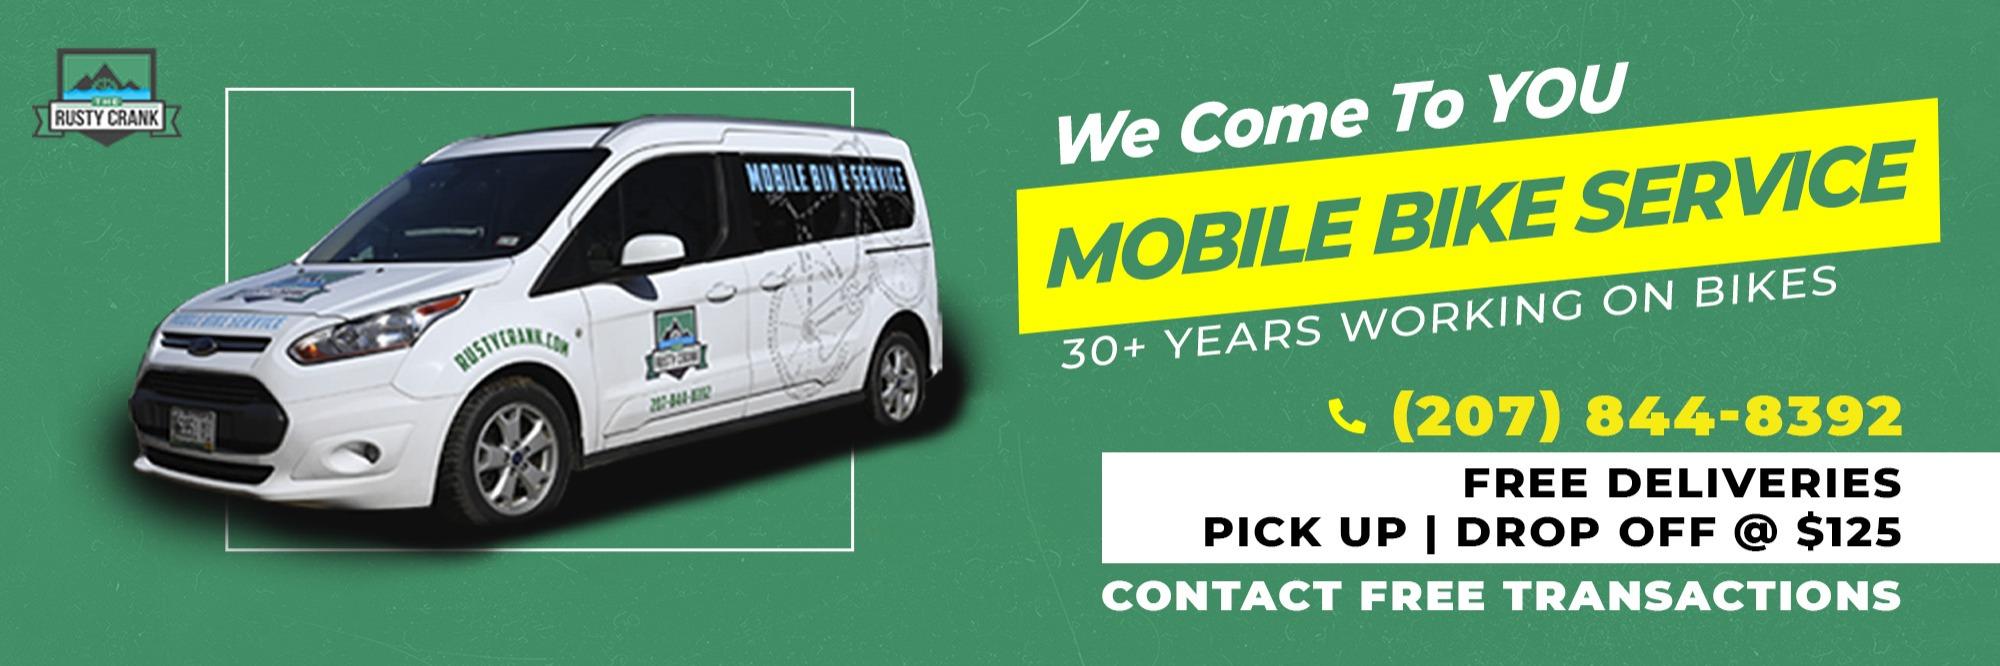 Mobile Bike Service - van - free deliveries, pick up or drop off at $125